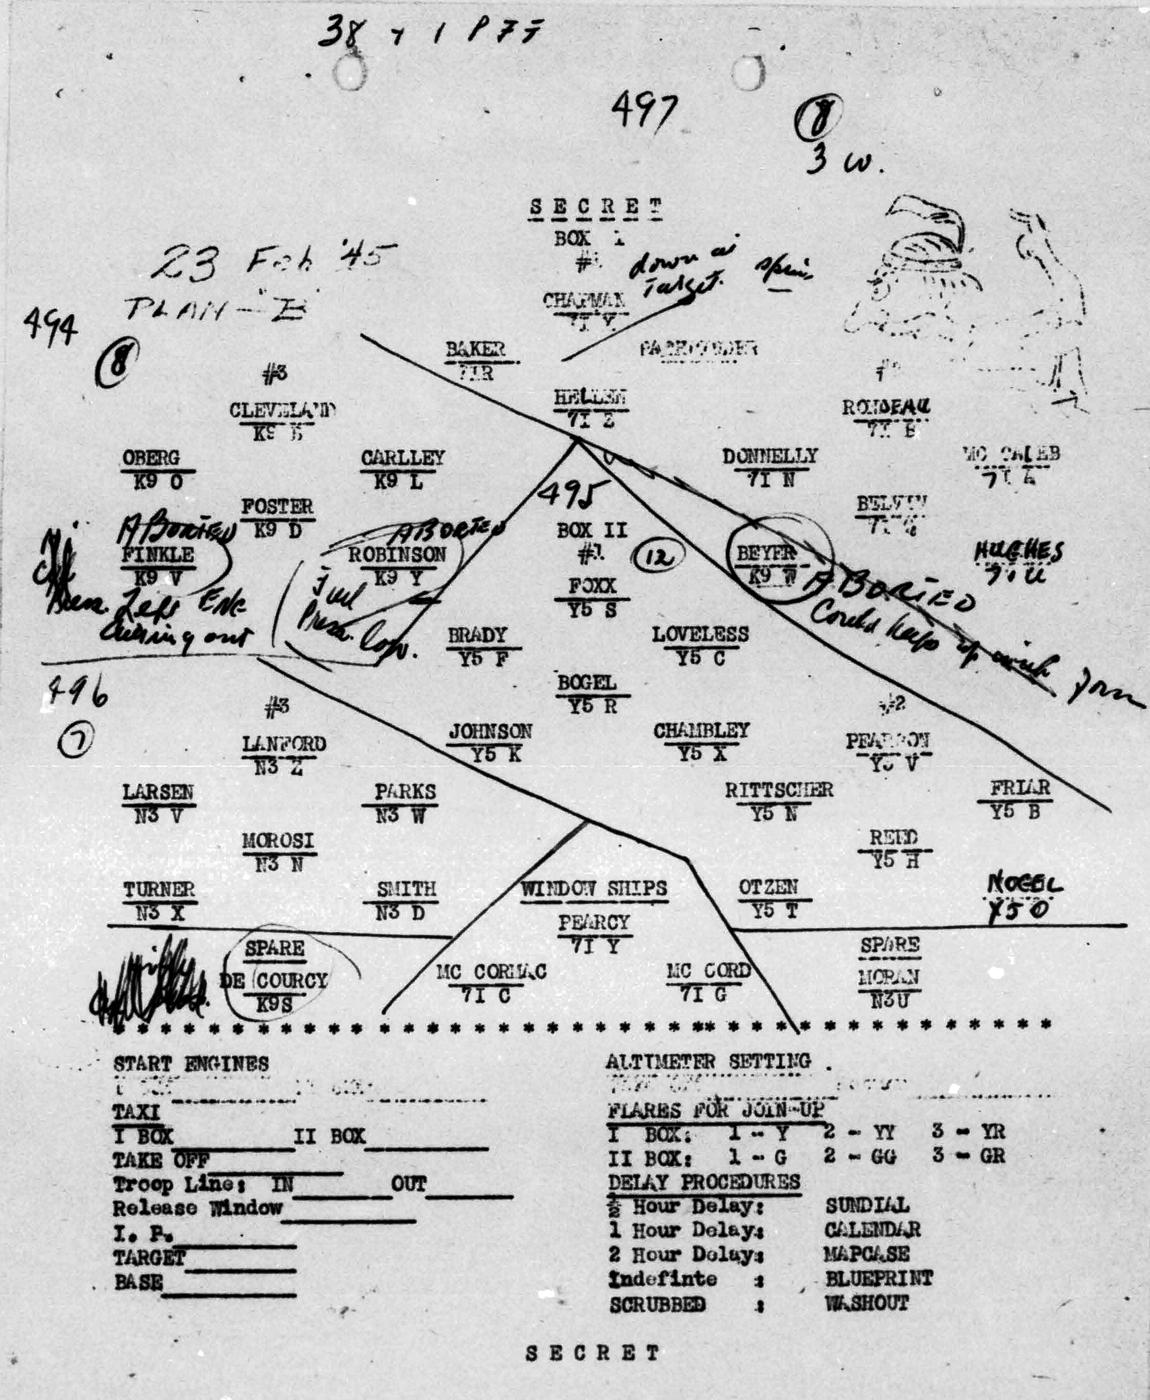 Chapman Storey B0297 p1977 Form Feb 23, 1945